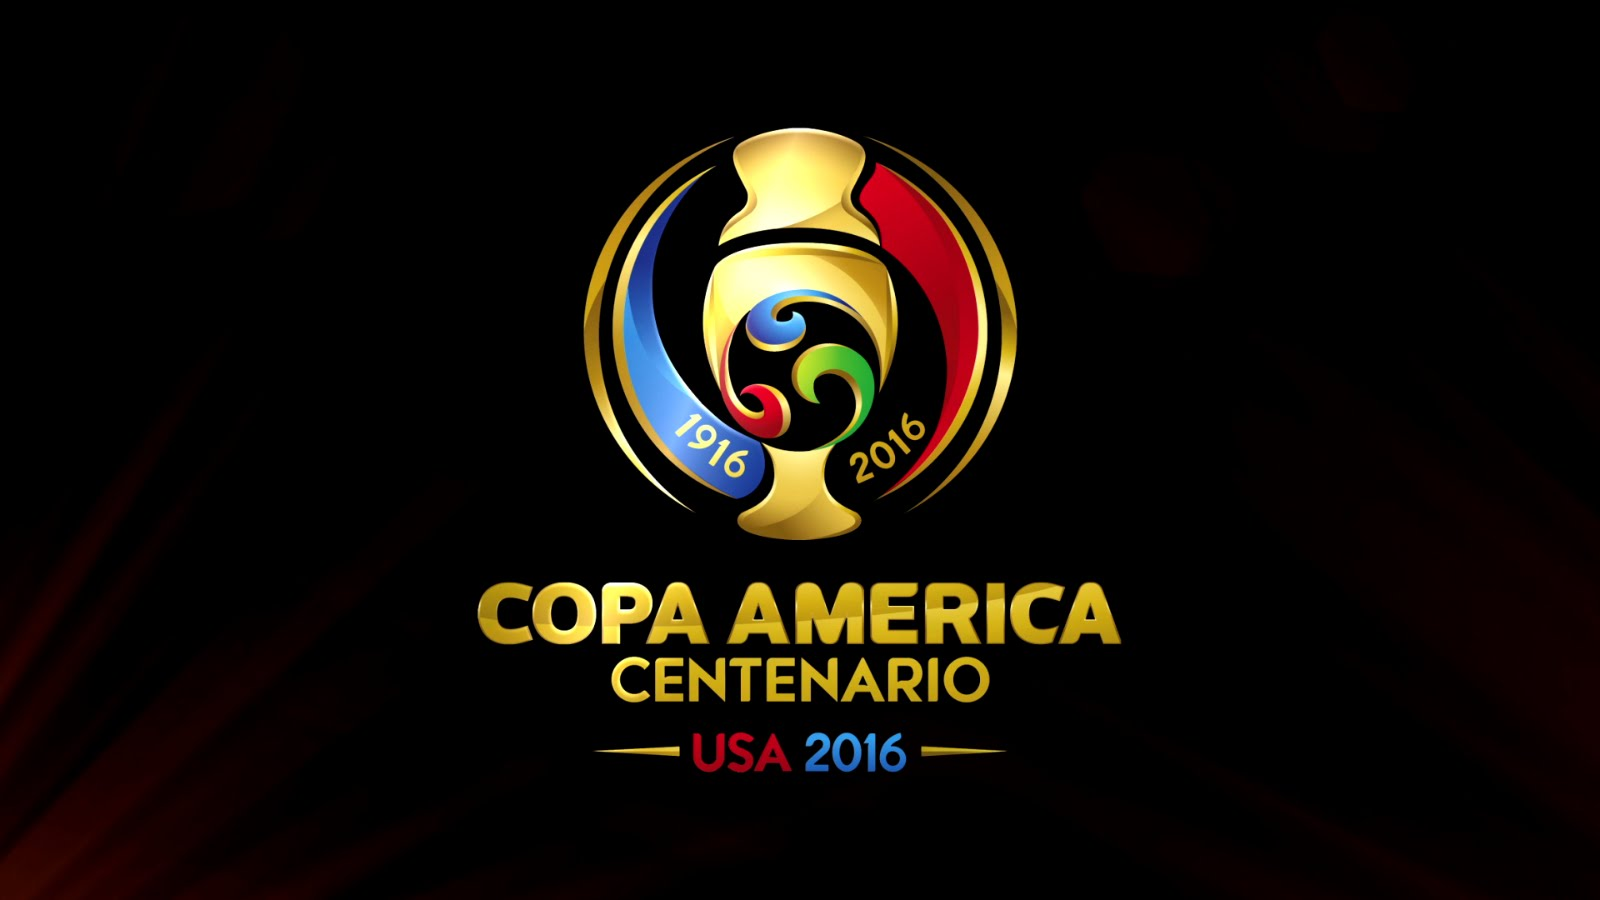 Orlando To Host Copa America Centenario 2016